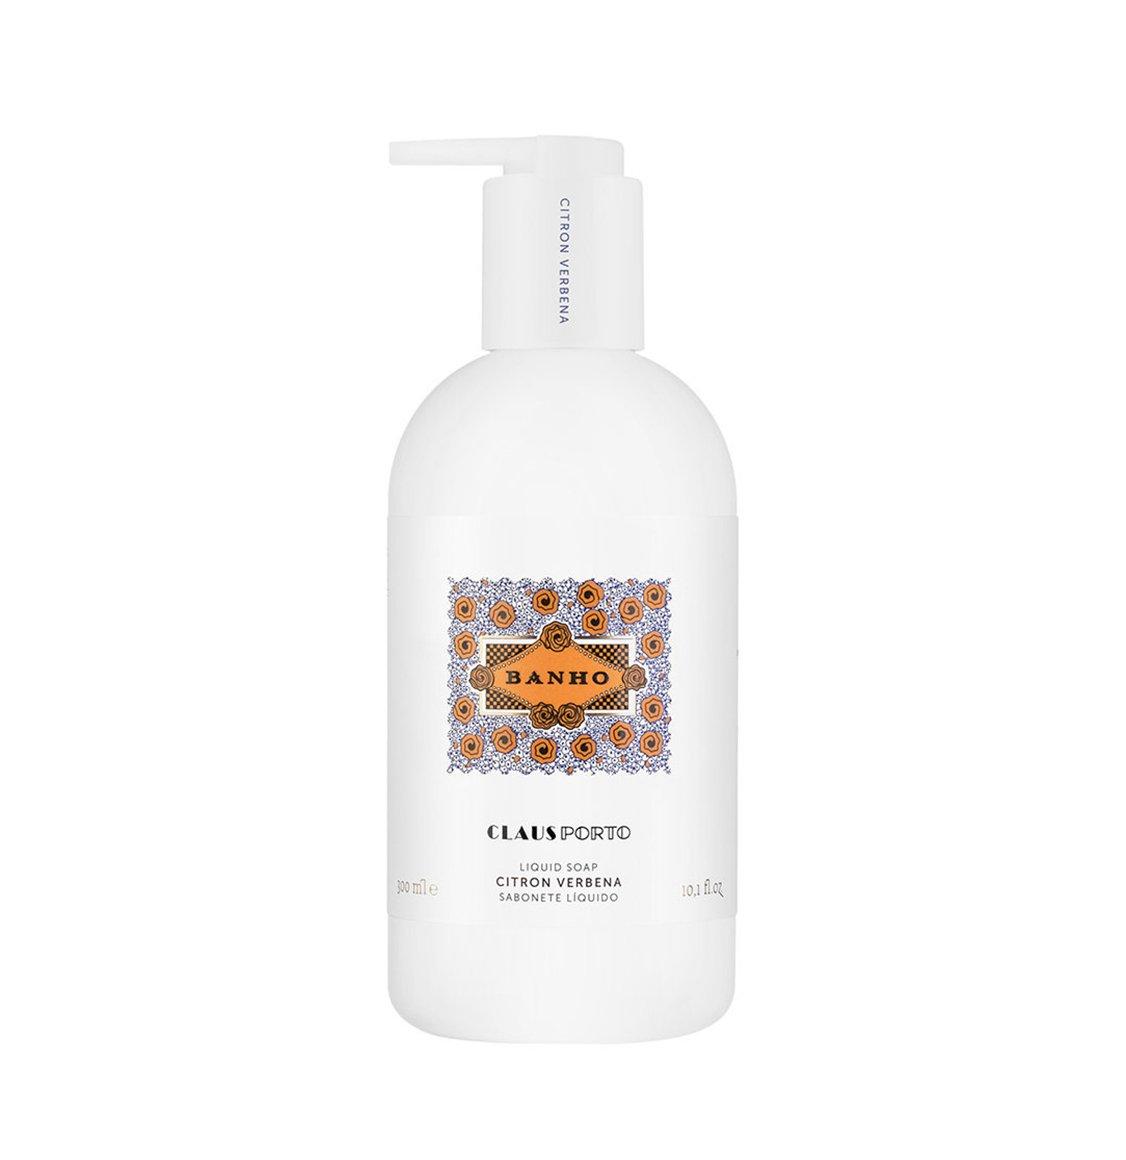 Claus Porto Deco Banho Liquid Soap 300ml